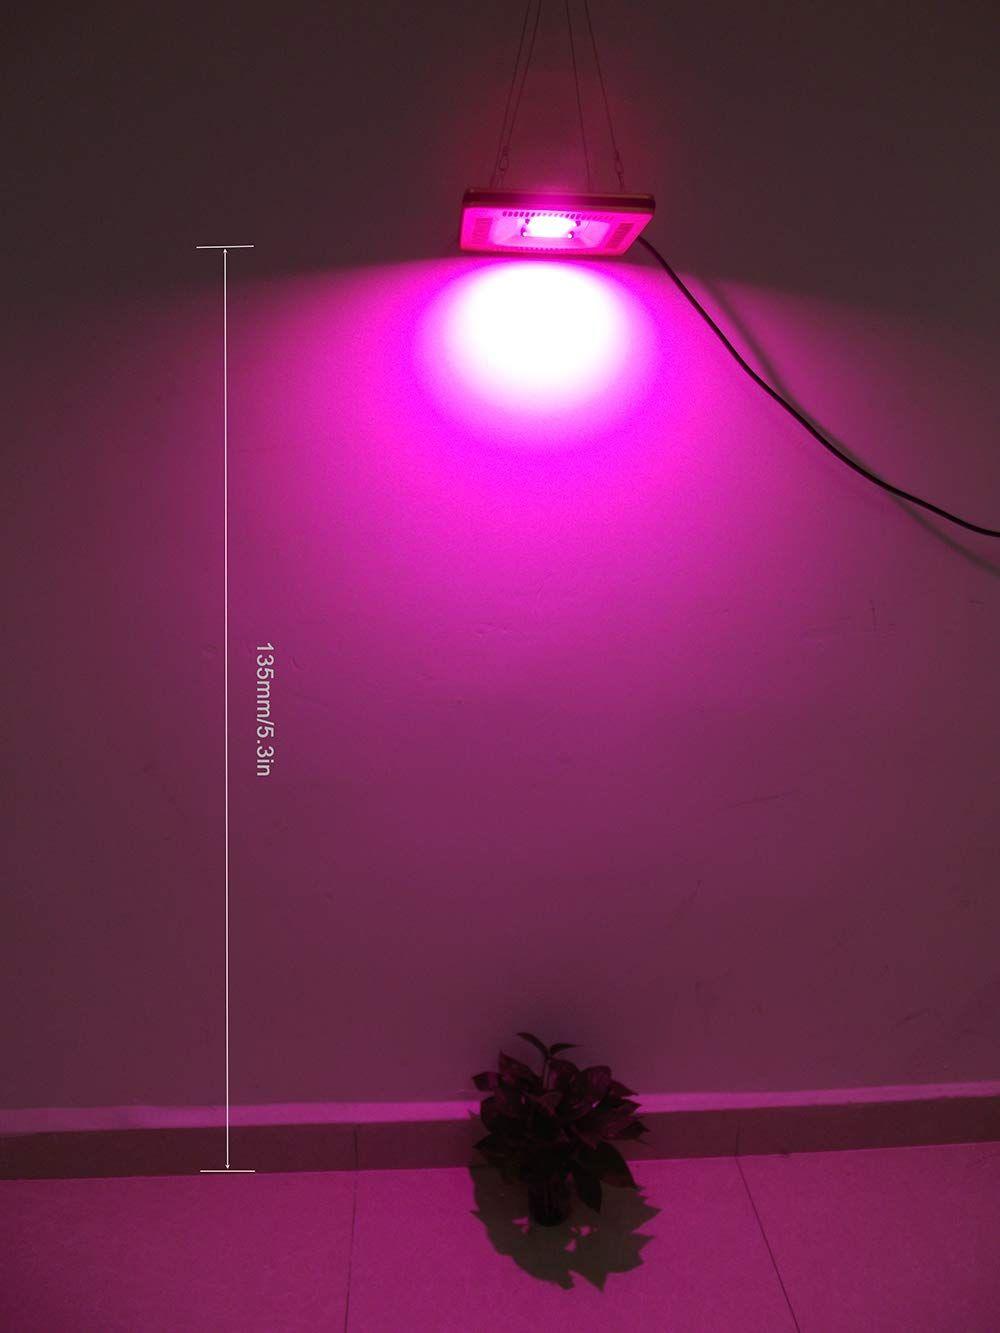 Ultrathin No Noise Led Grow Light Set Nano Waterproof Ip67 Full Spectrum Cob 50w Grow Light Mount 300w Halogen Bulb In 2020 Led Grow Lights Hps Grow Lights Grow Lights